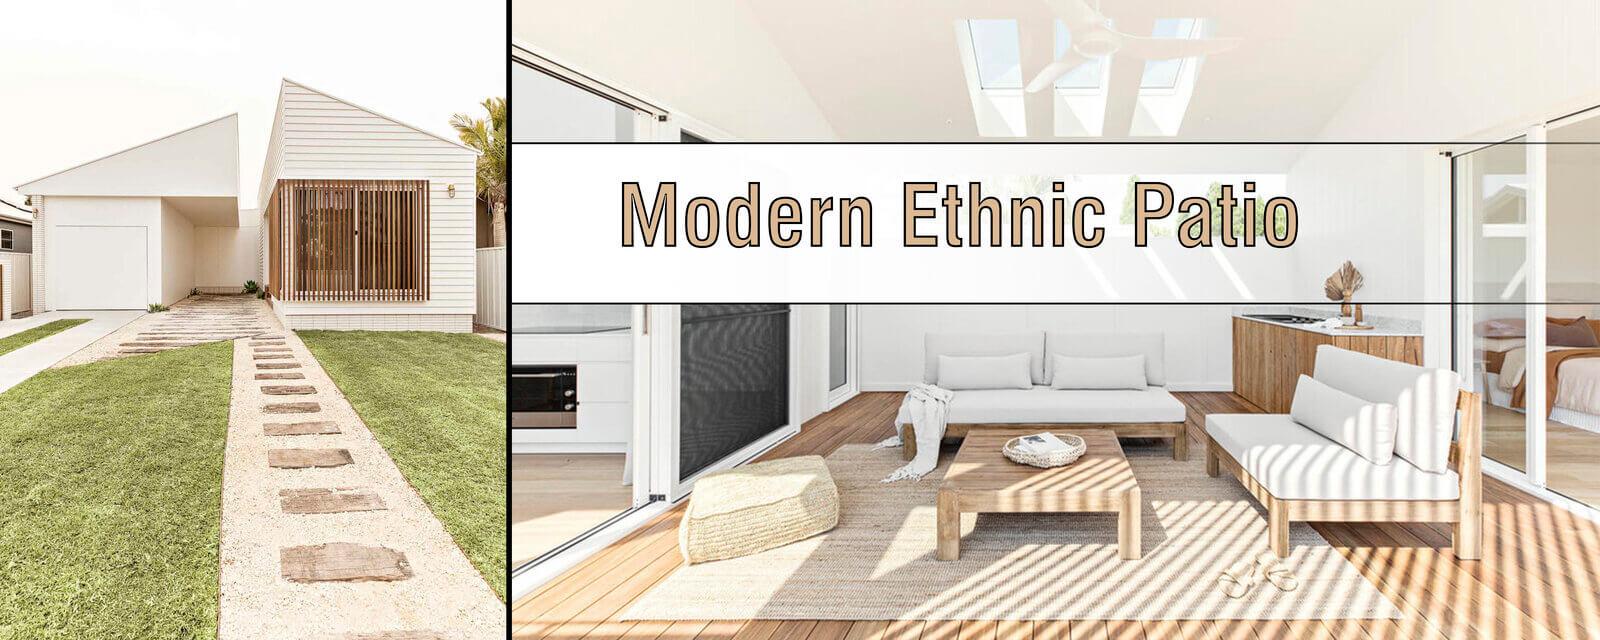 Modern Ethnic Patio